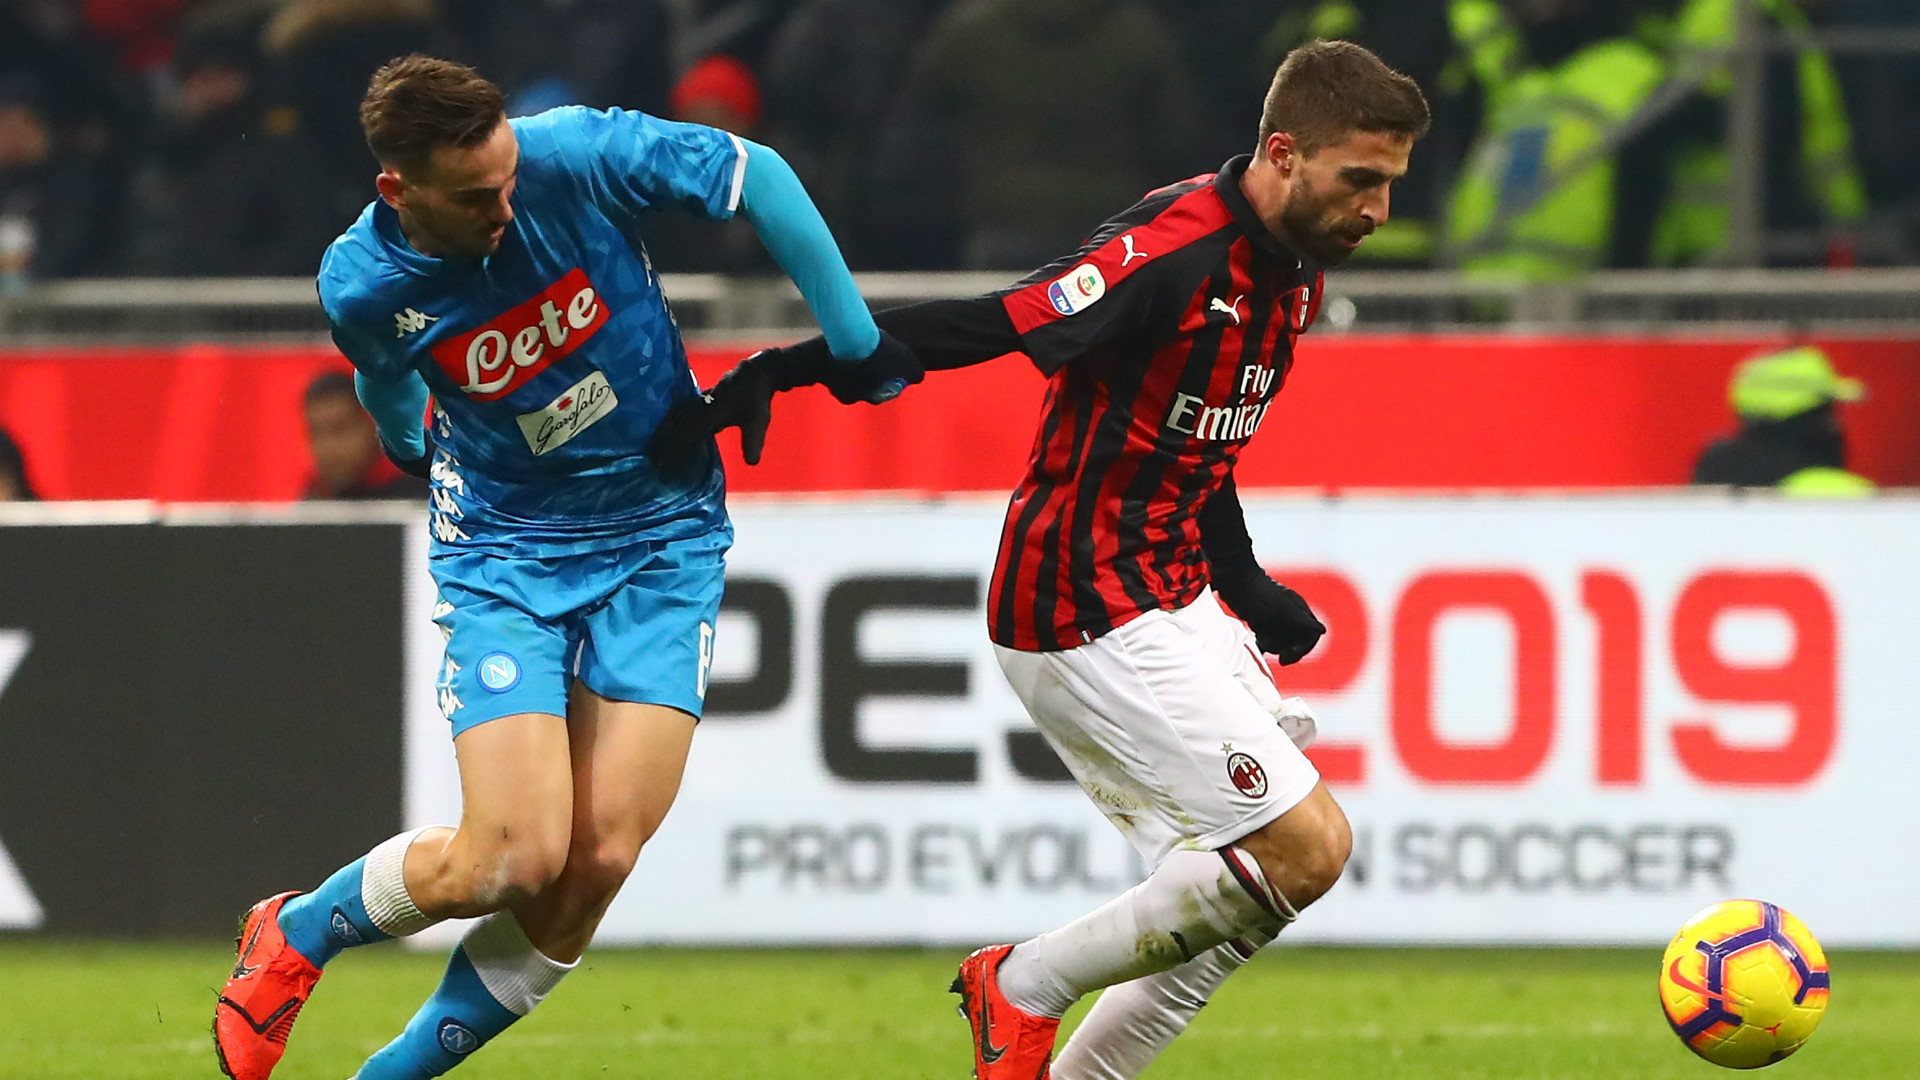 Milan-Napoli, Gattuso ci crede: